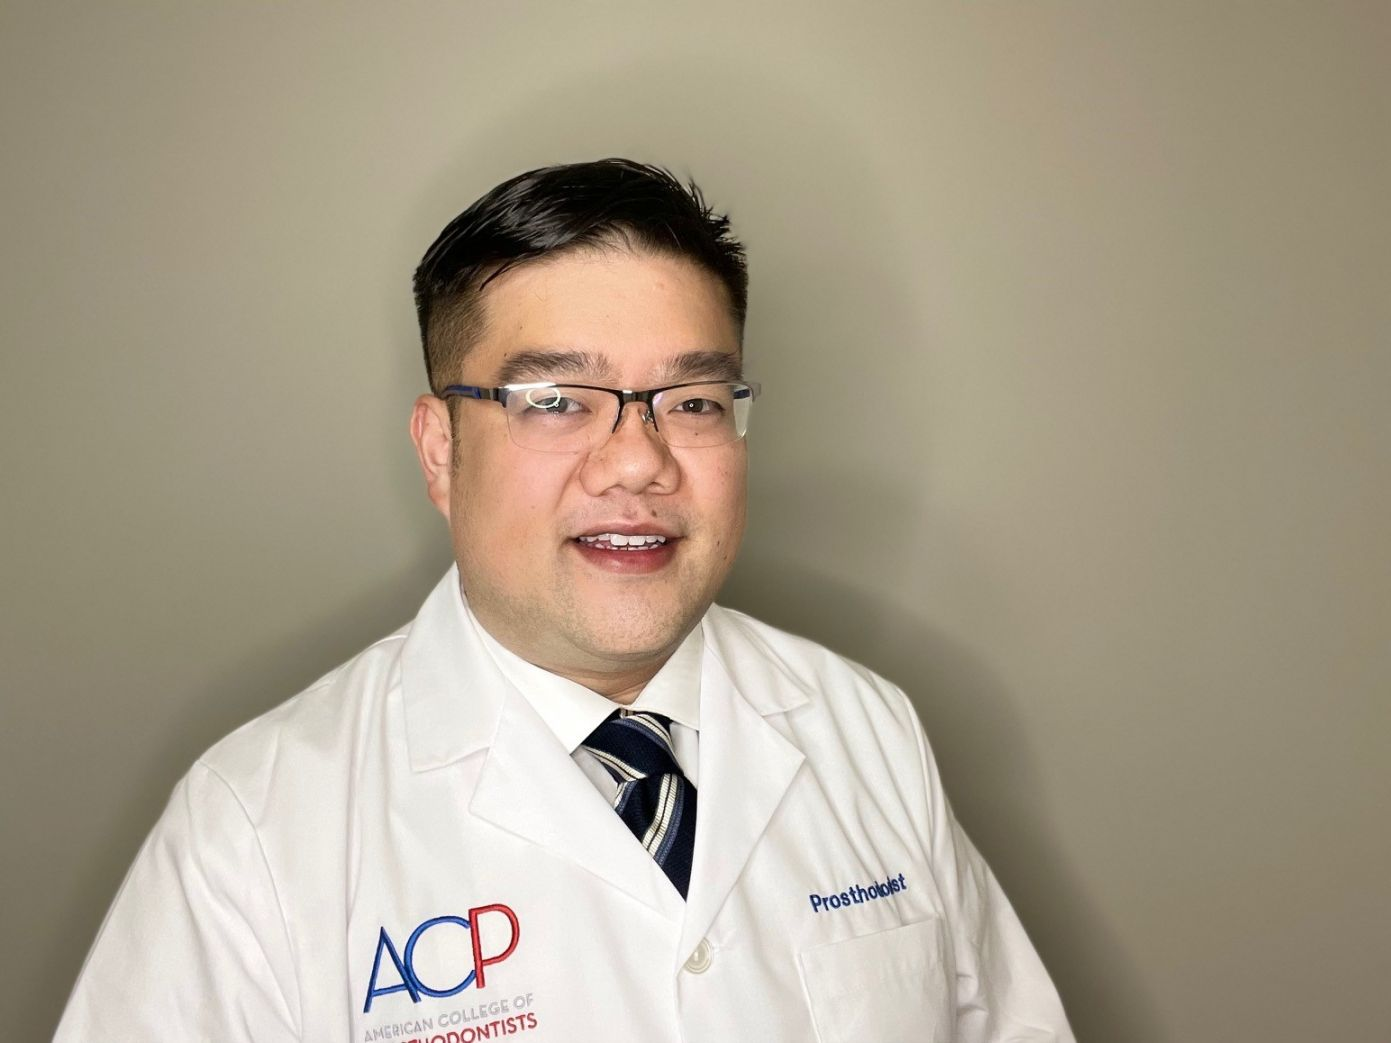 Peterson Huang Board Certified Prosthodontist